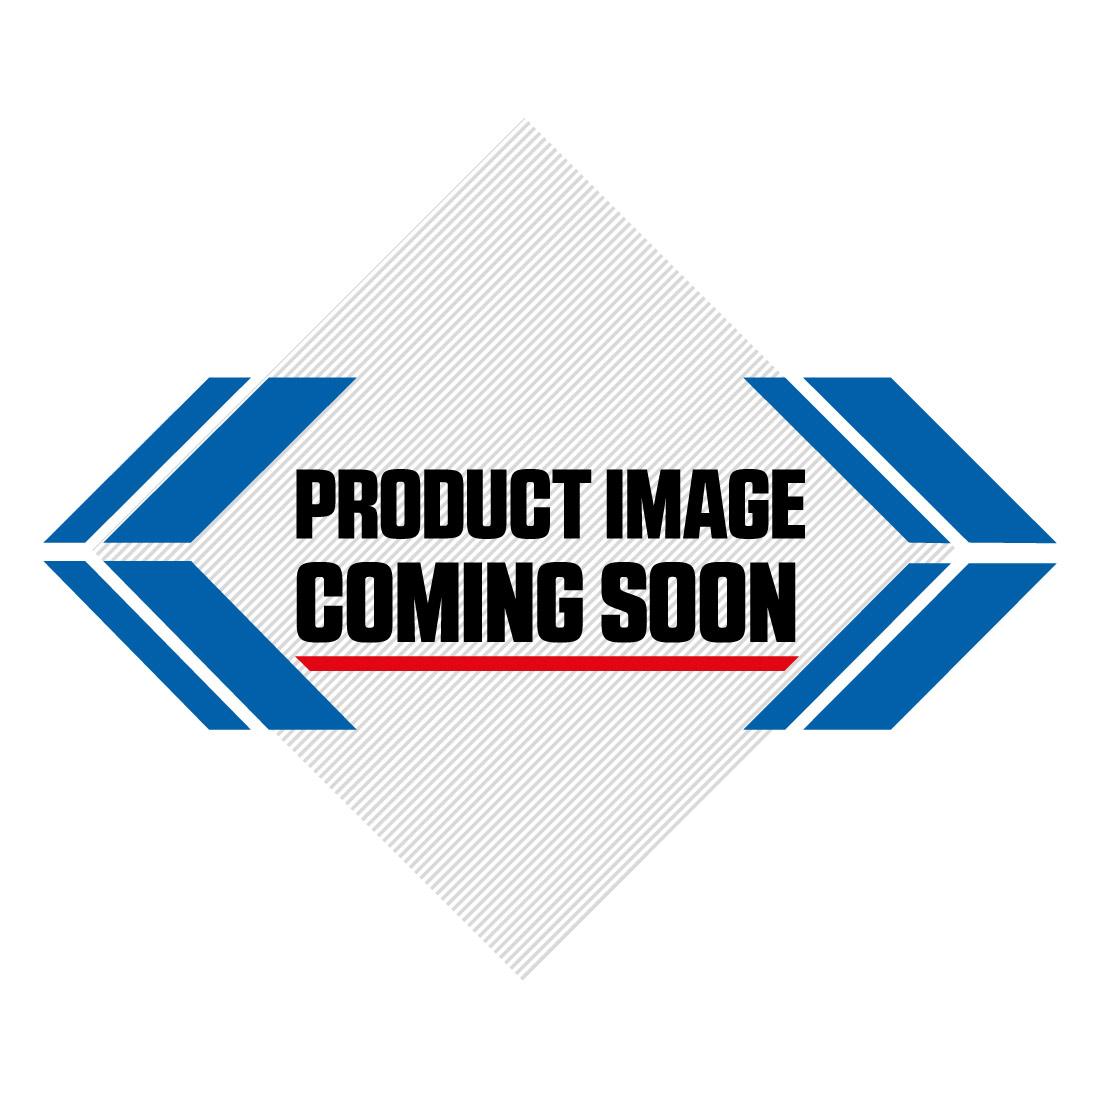 Renthal Twinring Rear Sprocket KTM SX SX-F EXC EXC-F Husqvarna TC FC TE FE - Orange Image-2